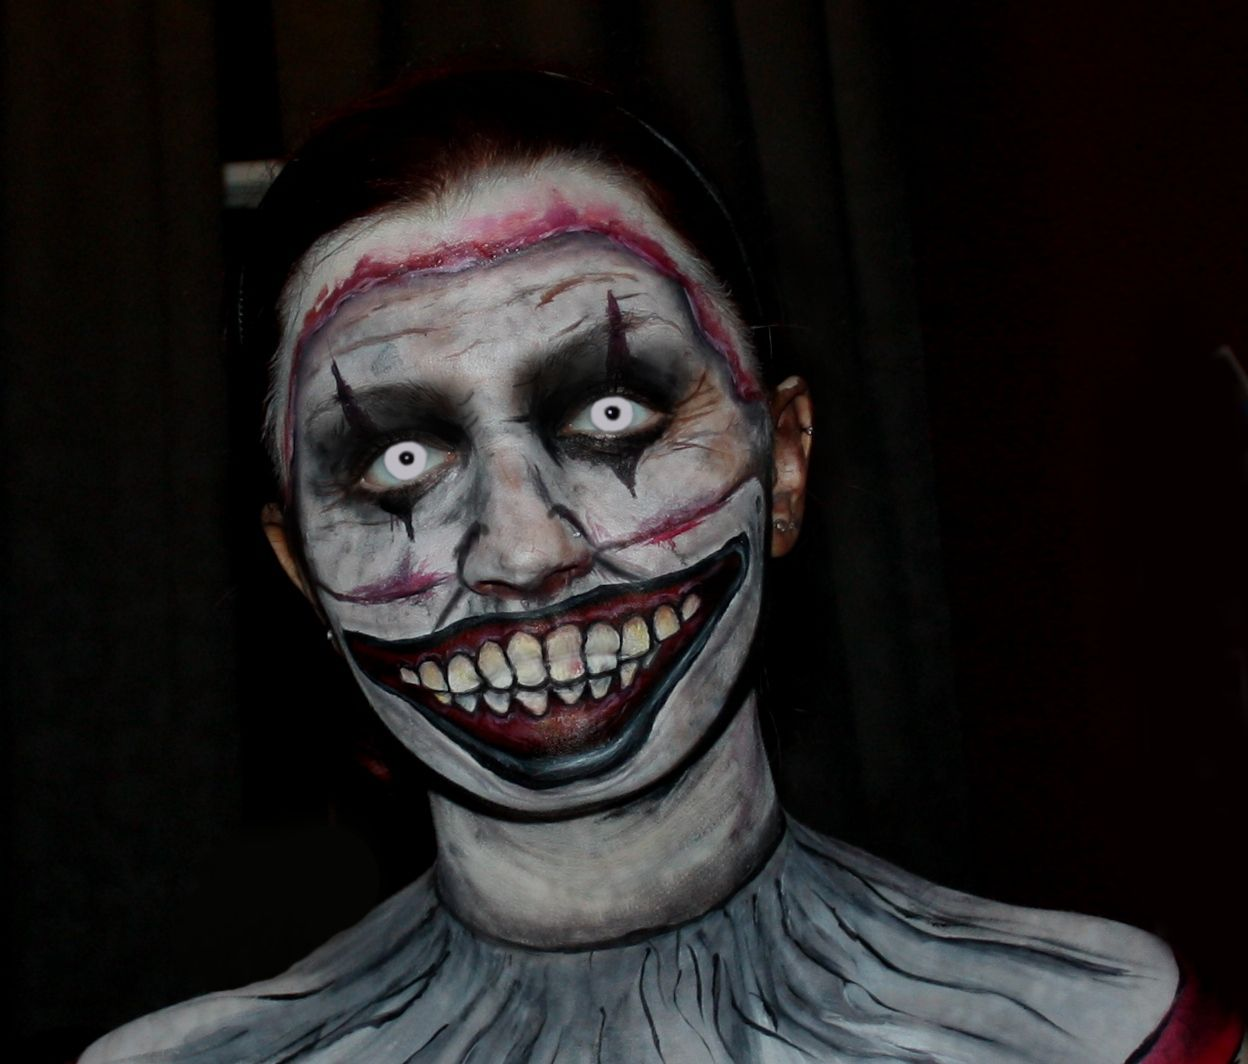 twisty the clown american horror story halloween | Costume Ideas ...